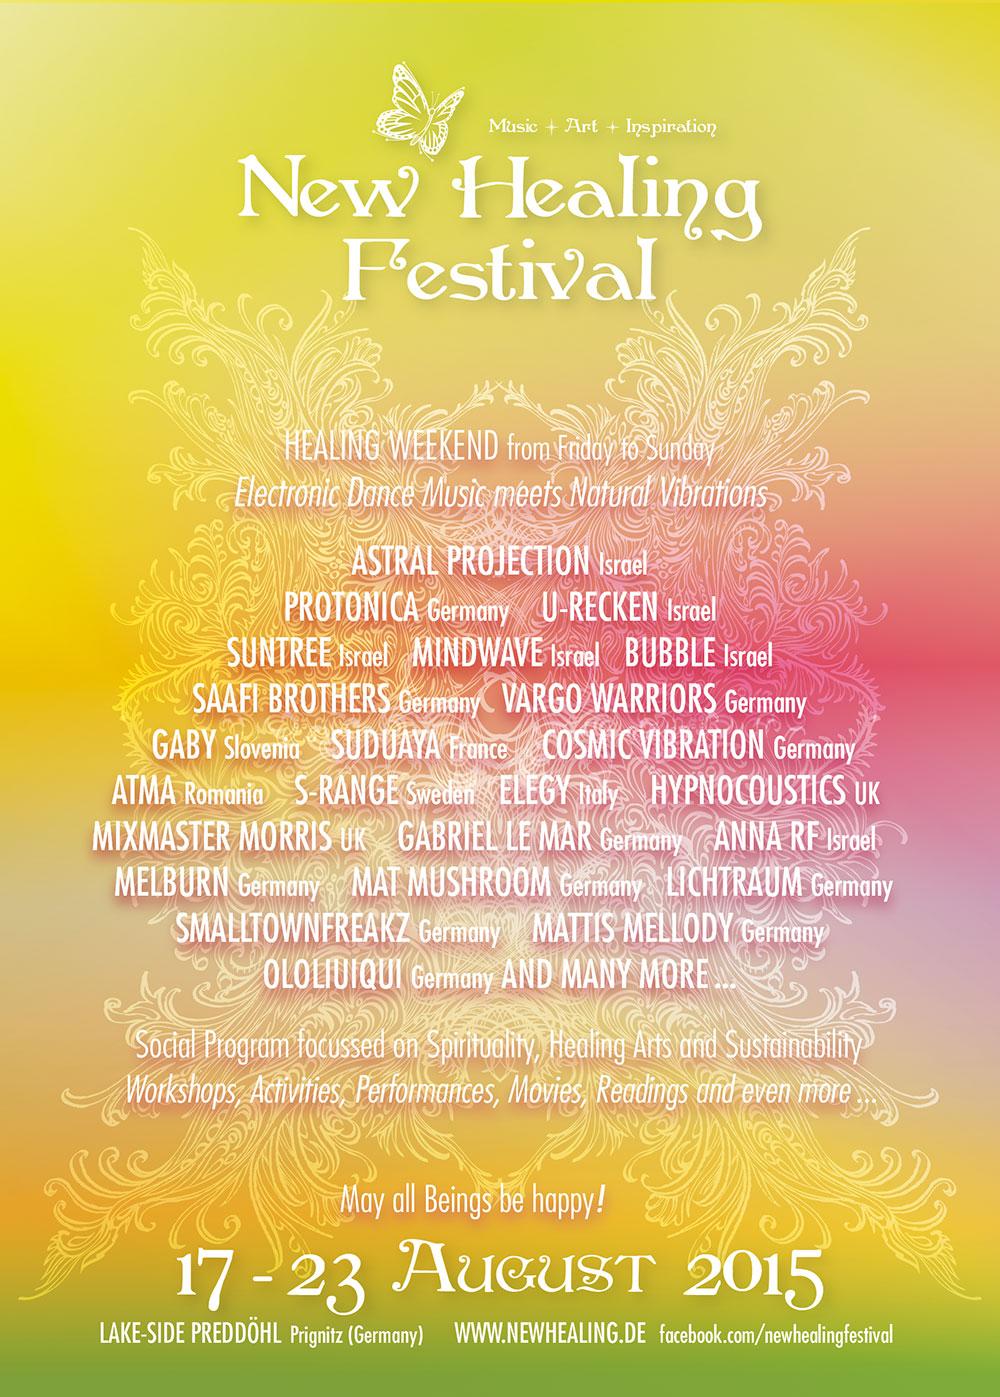 New Healing Festival